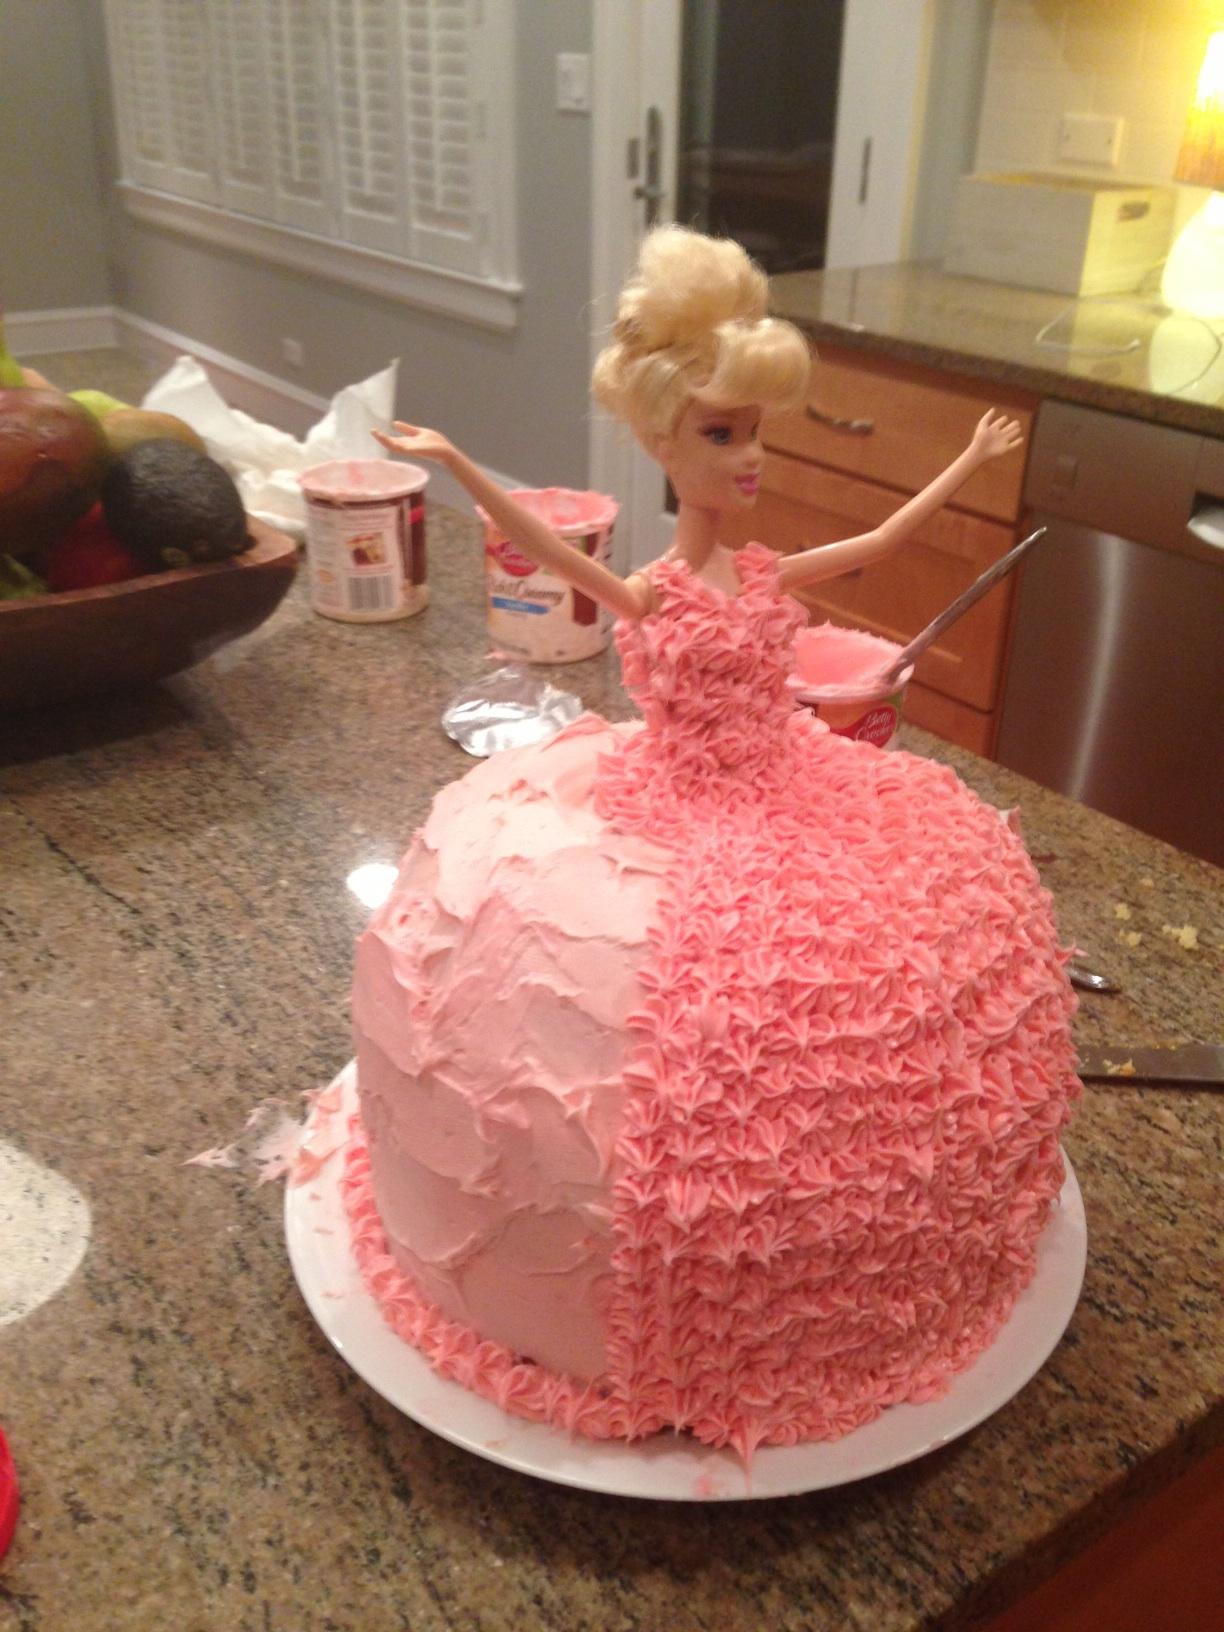 7 4 Year Old Girl Cakes Photo 4 Year Old Girl Birthday Cake 4